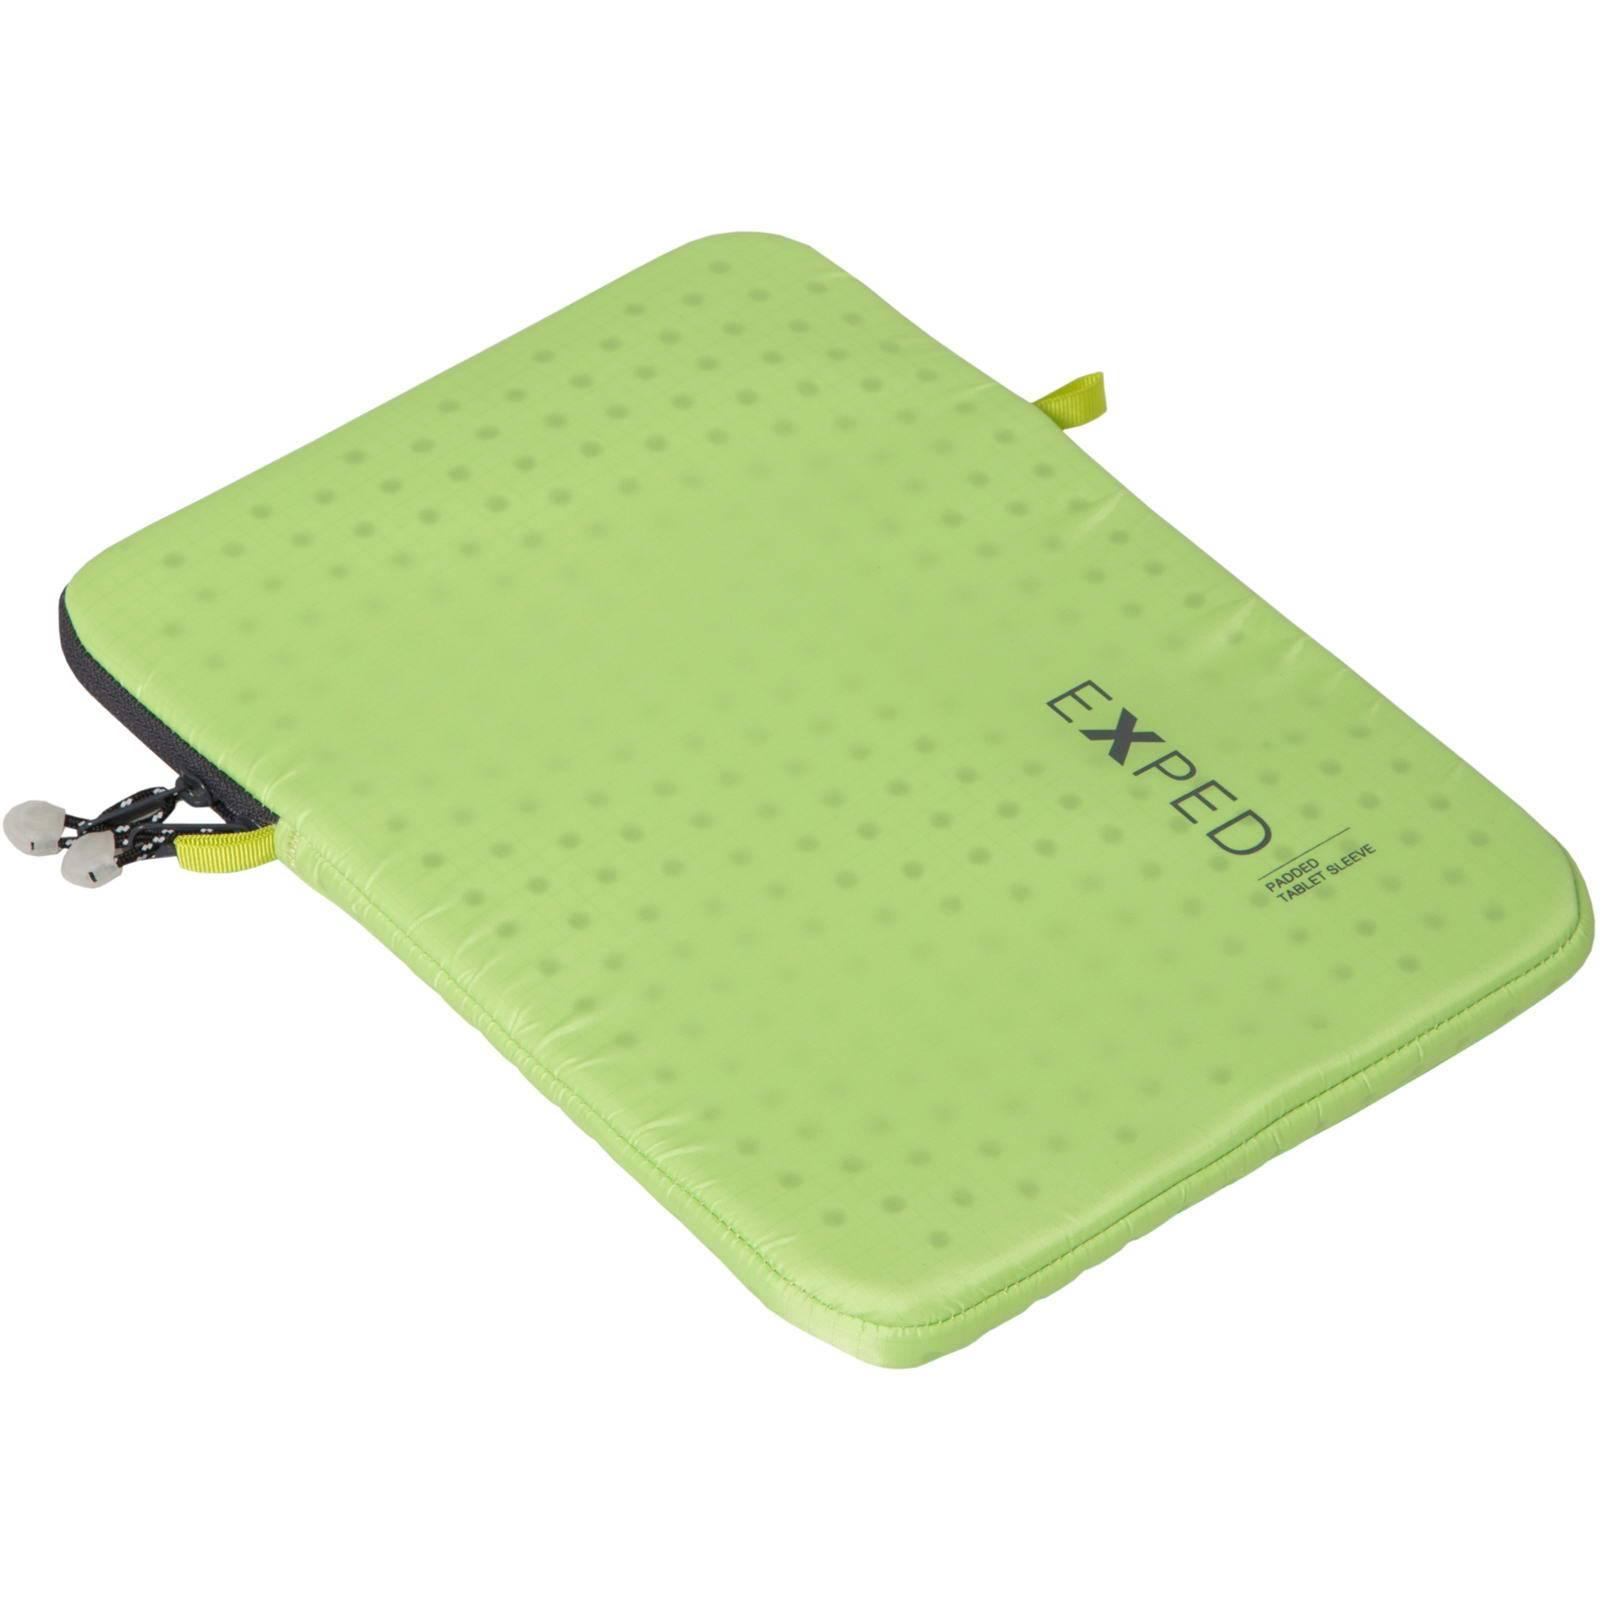 EXPED Padded Tablet Sleeve 10 - Schutzhülle lime - Bild 1